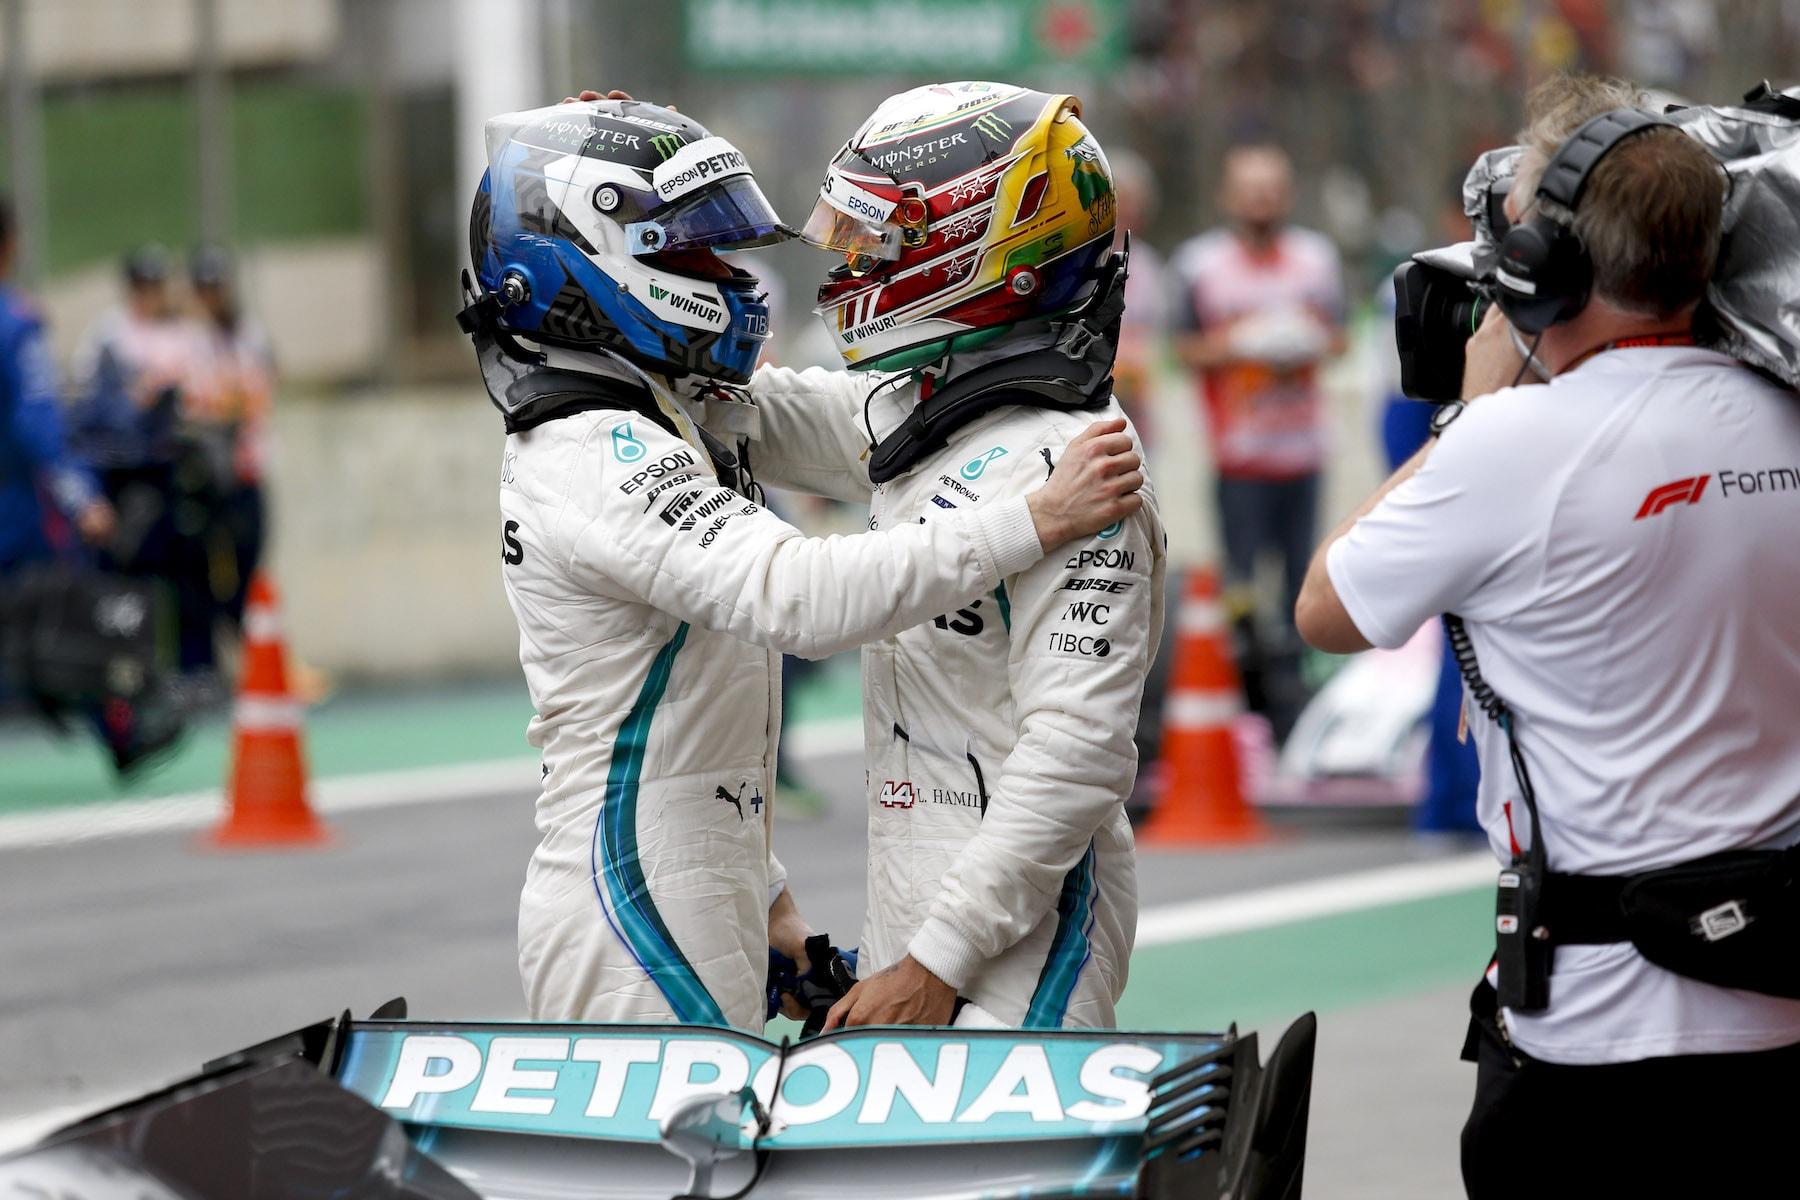 R 2018 Lewis Hamilton | Mercedes W09 | 2018 Brazilian GP winner 5 copy.jpg